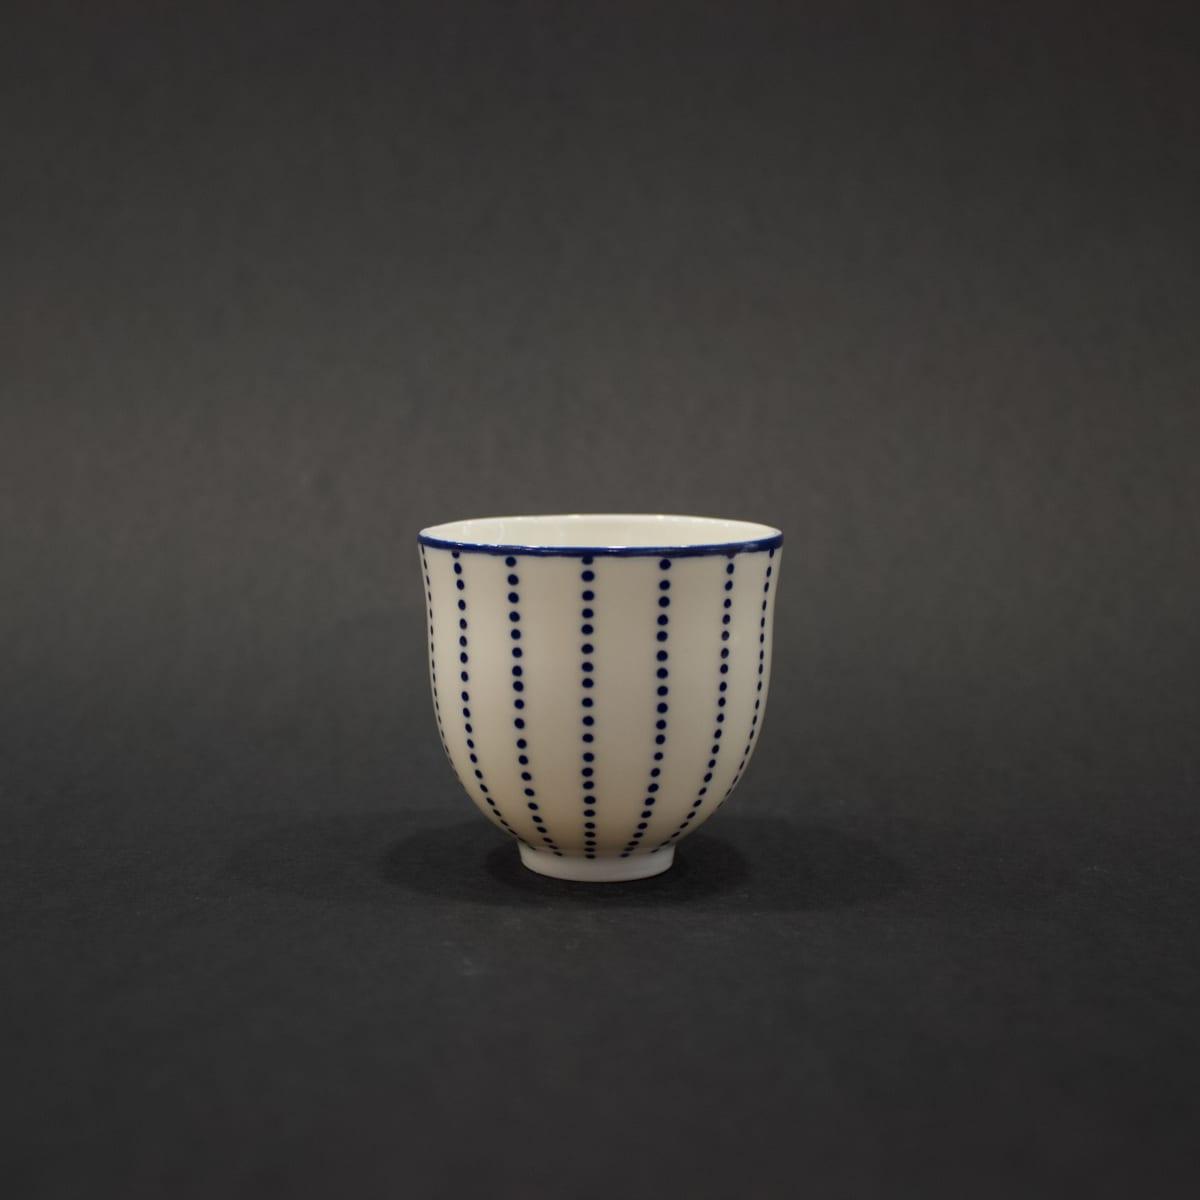 Rhian Malin Dotty Cup, 2019 Porcelain 6 x 6.5 x 6.5 cm 2 3/8 x 2 1/2 x 2 1/2 in